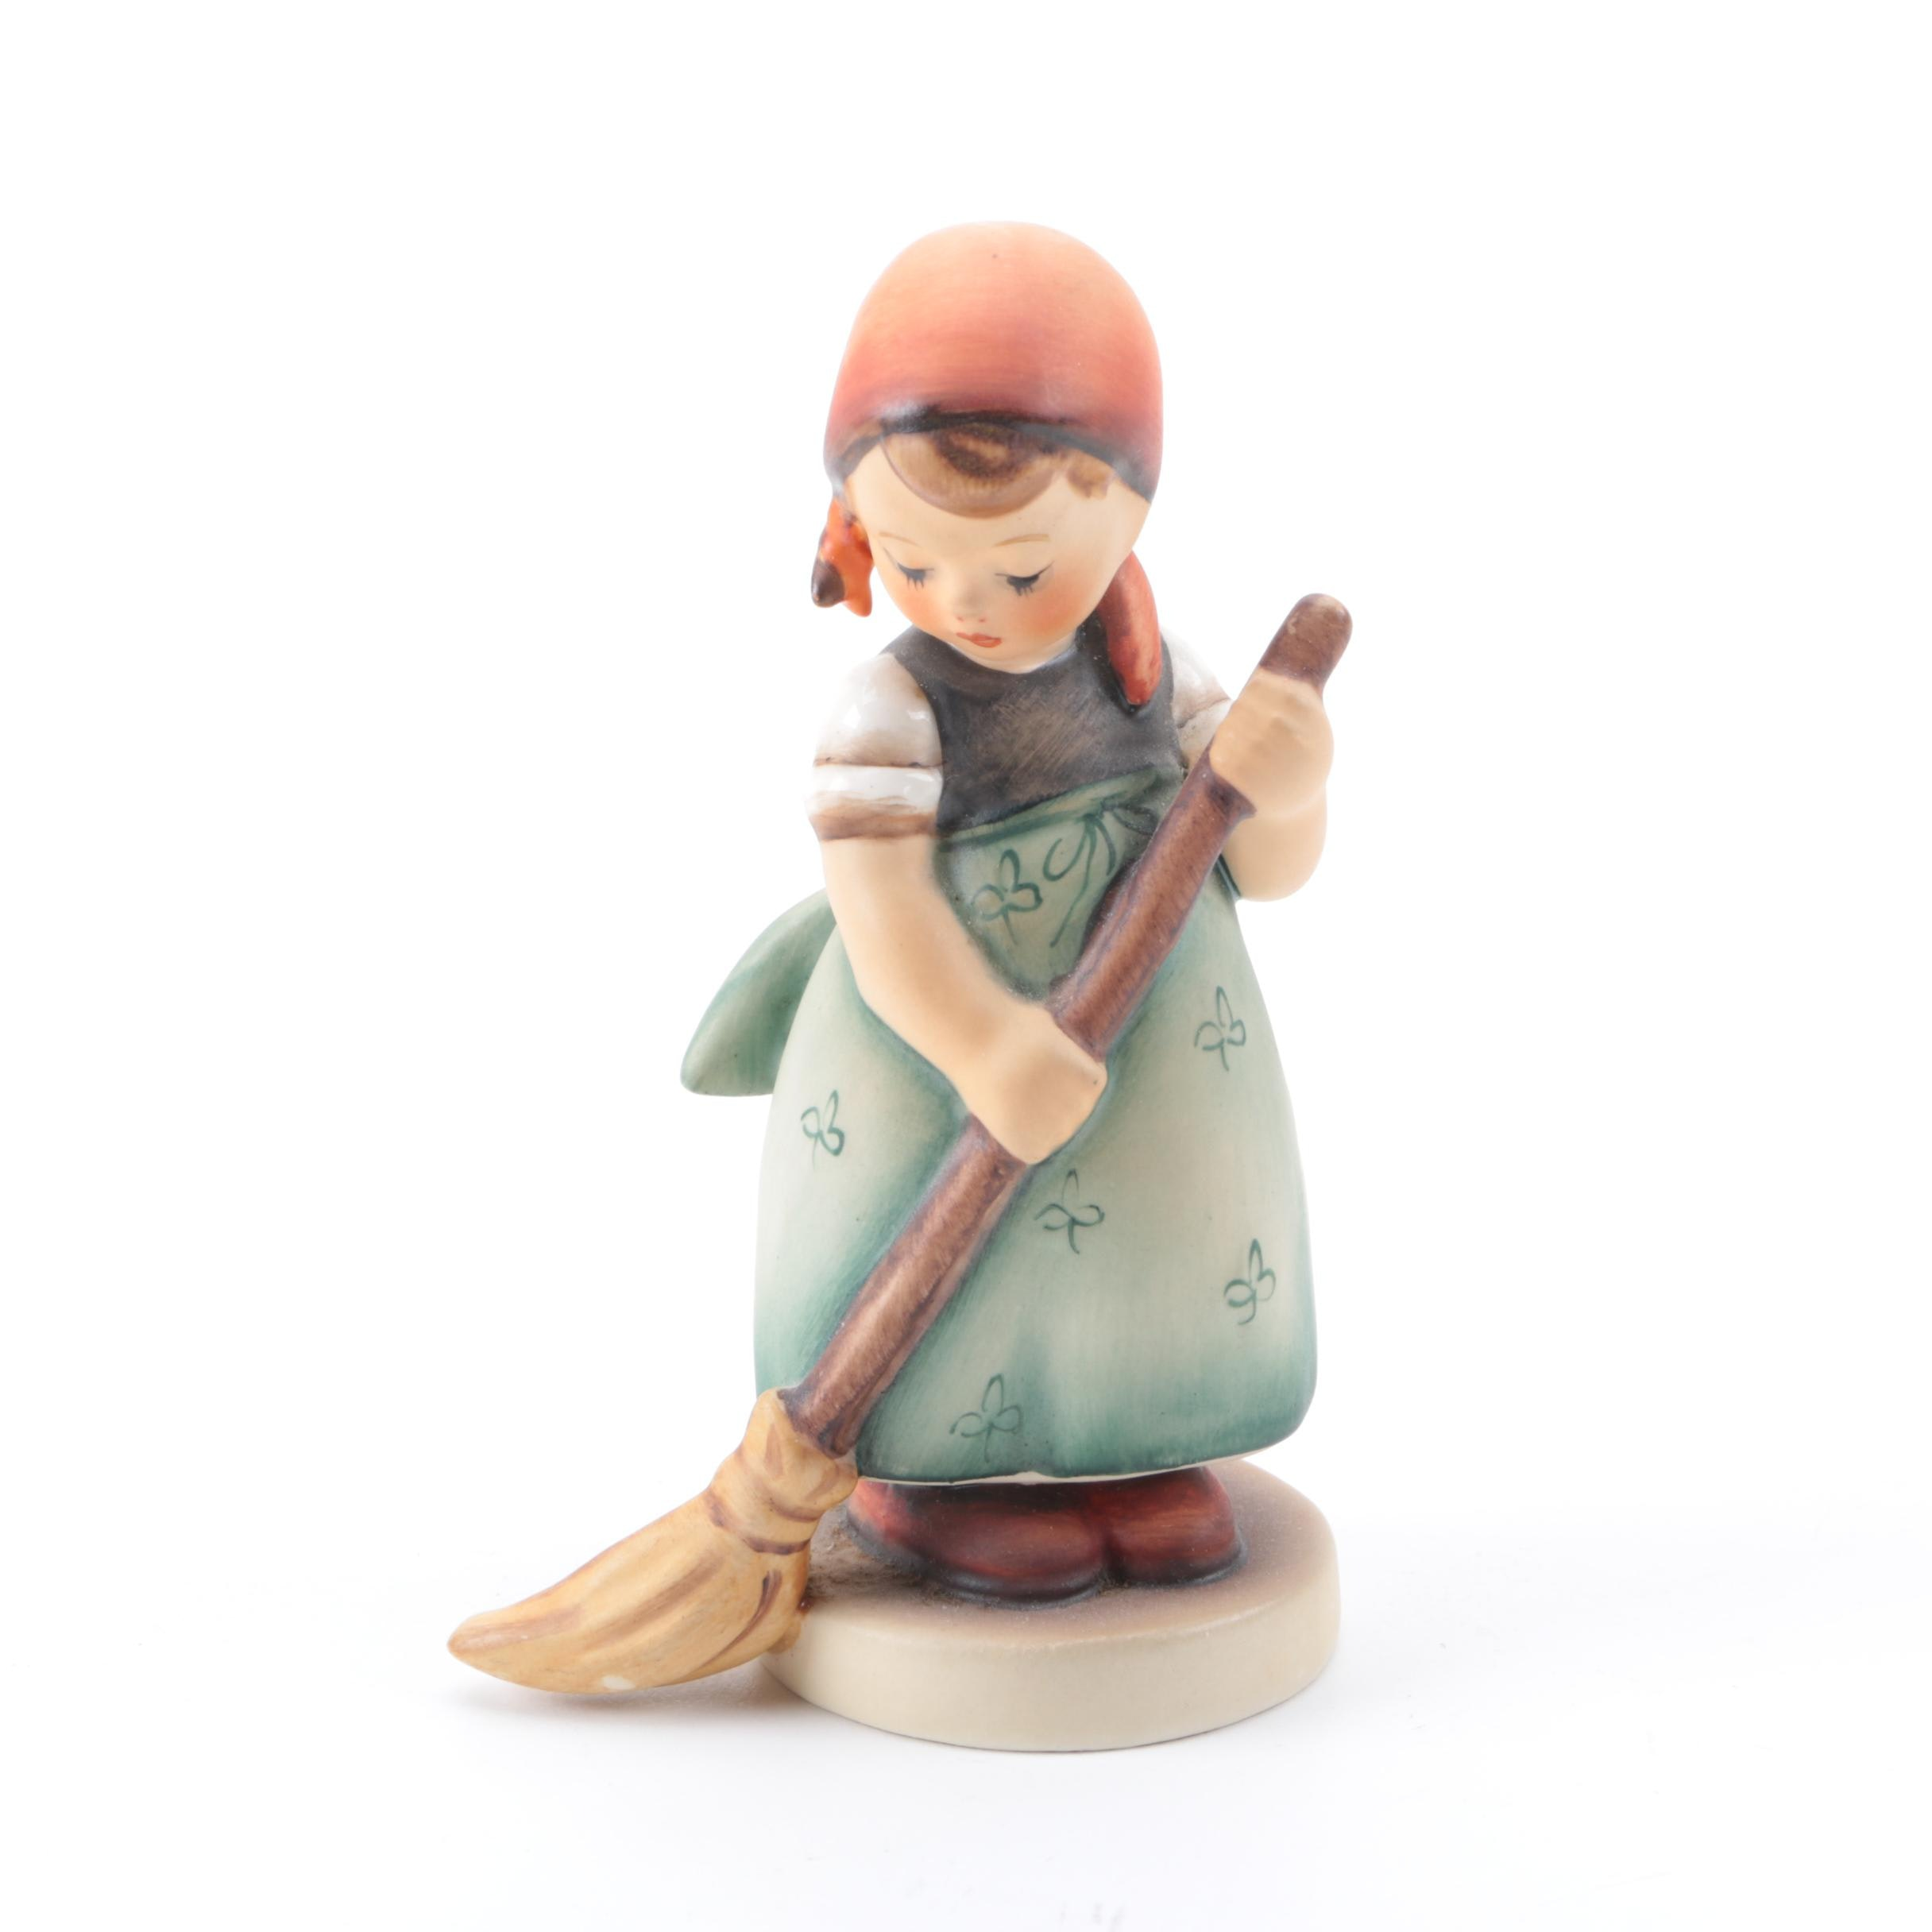 Vintage Goebel Ceramic Figurine of a Girl Sweeping